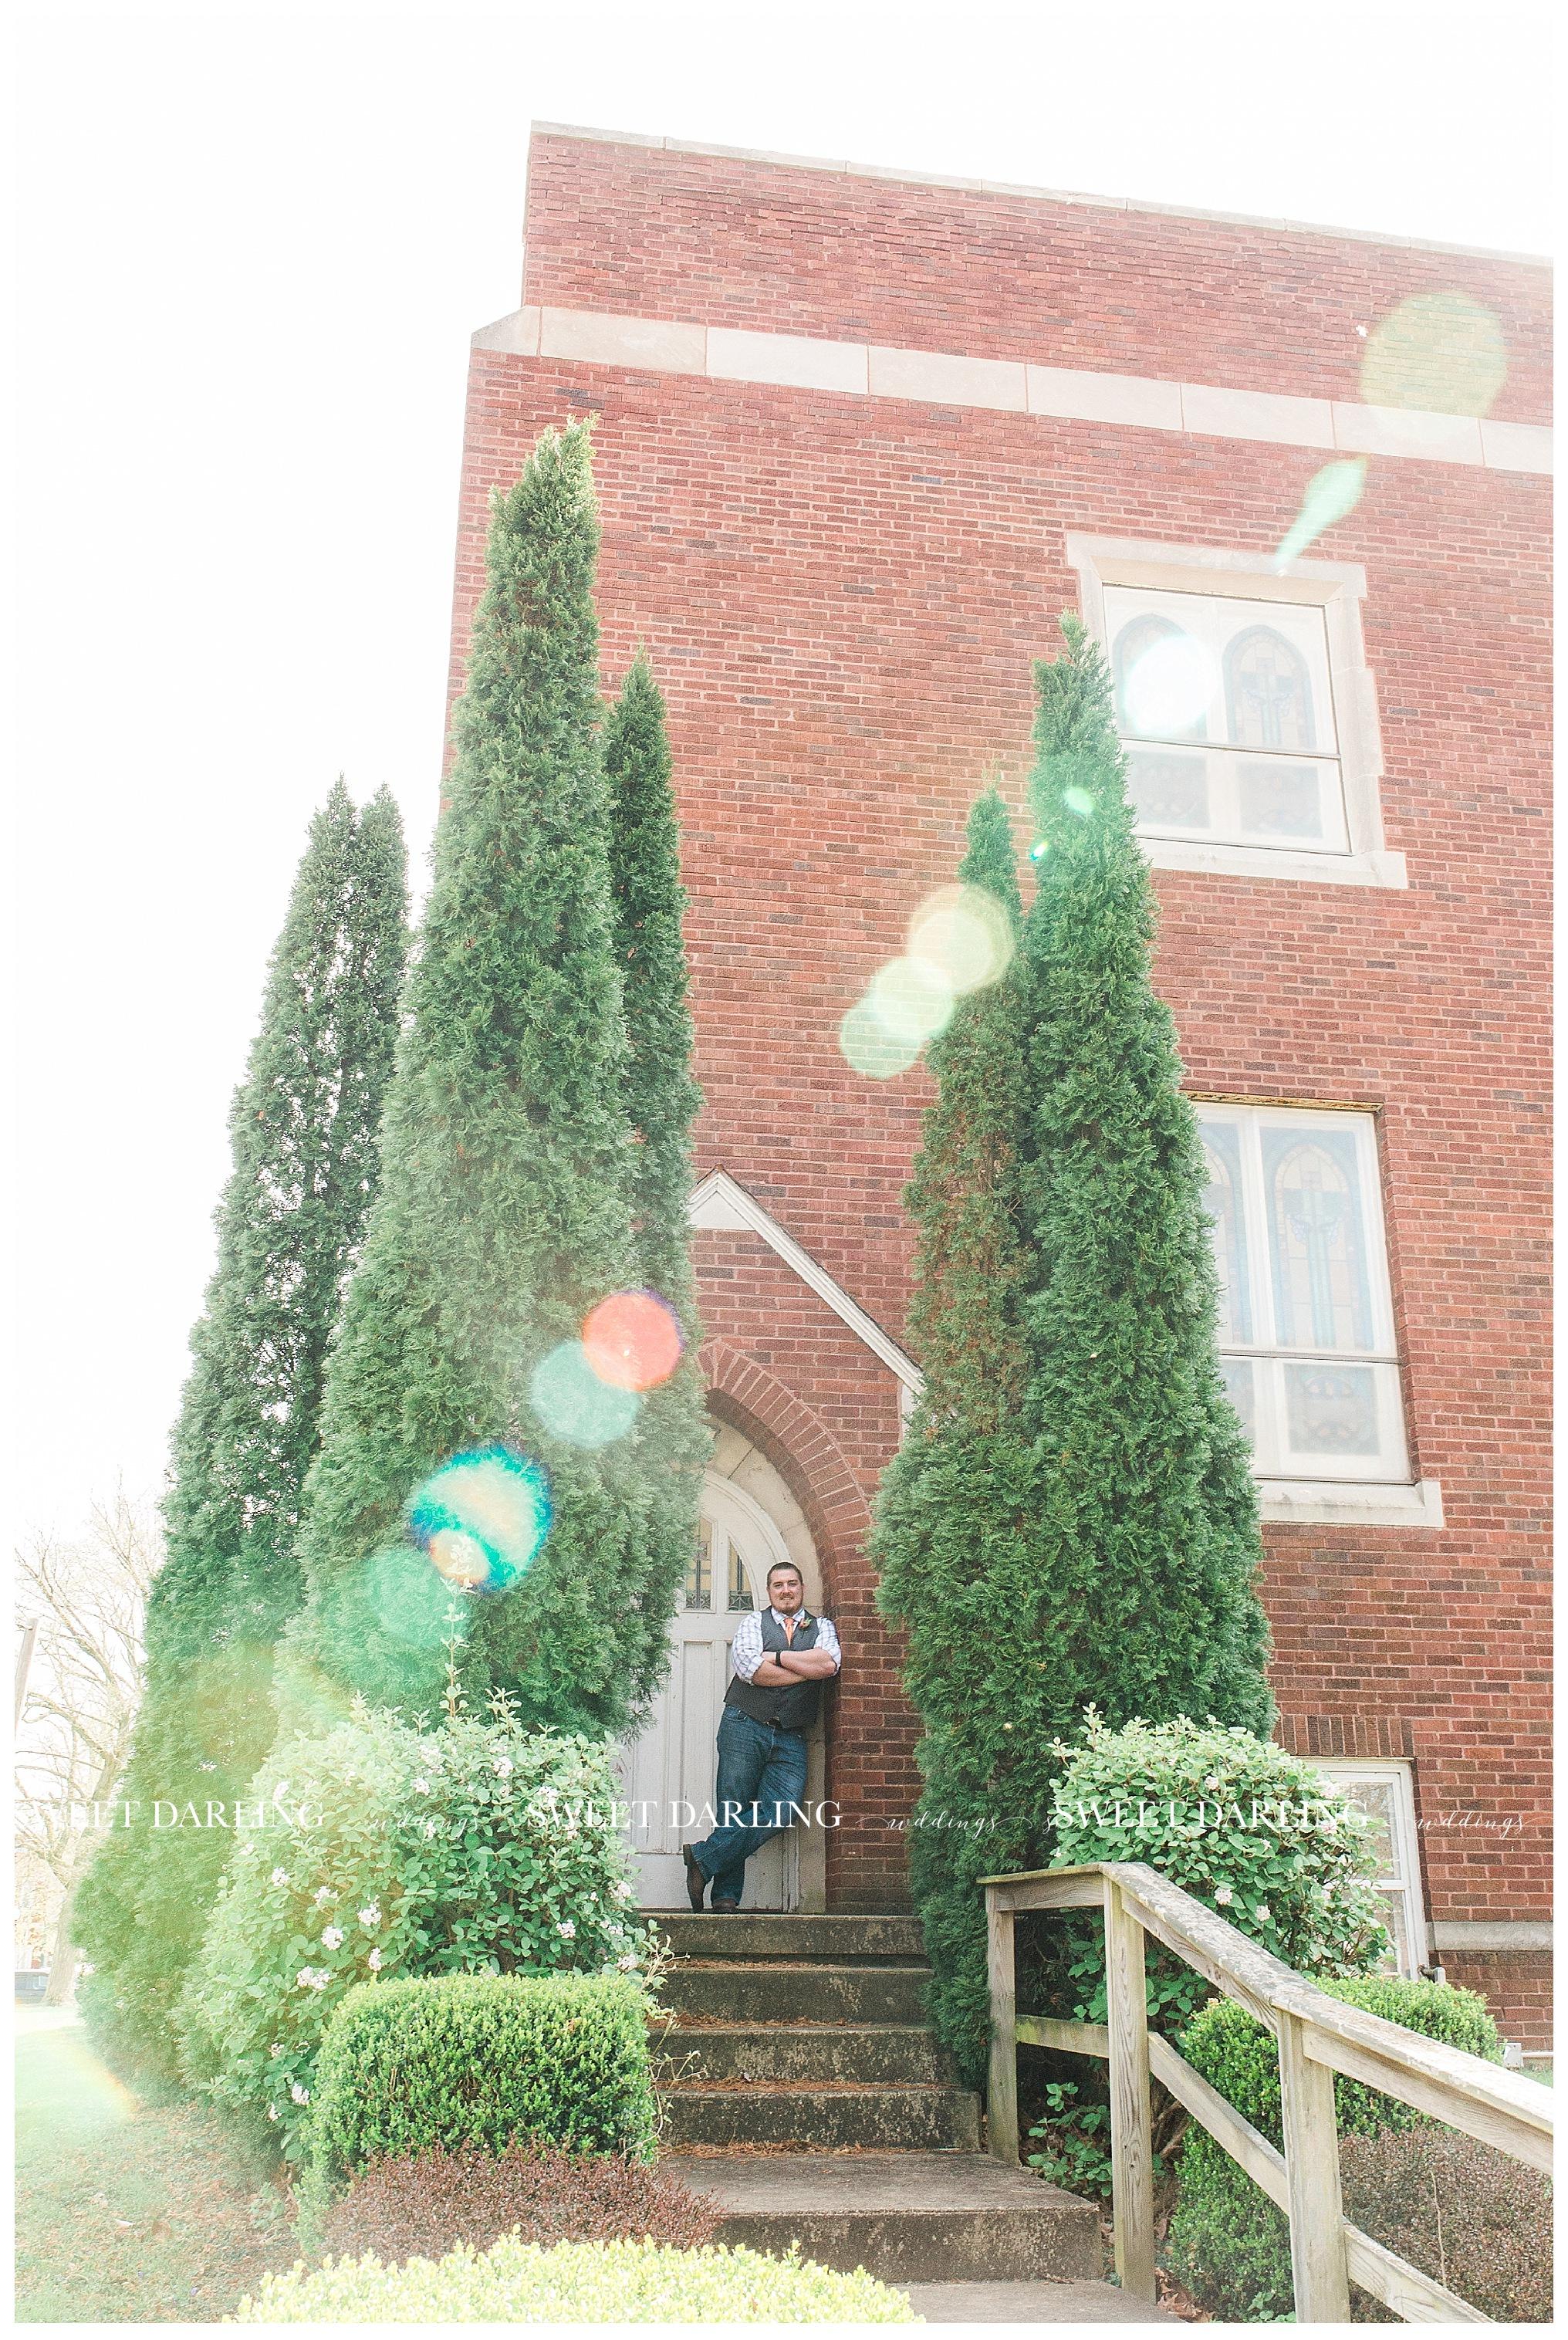 arcoloa-illinois-coles-county-wedding-photography-sweet-darling-weddings-photographer_0949.jpg